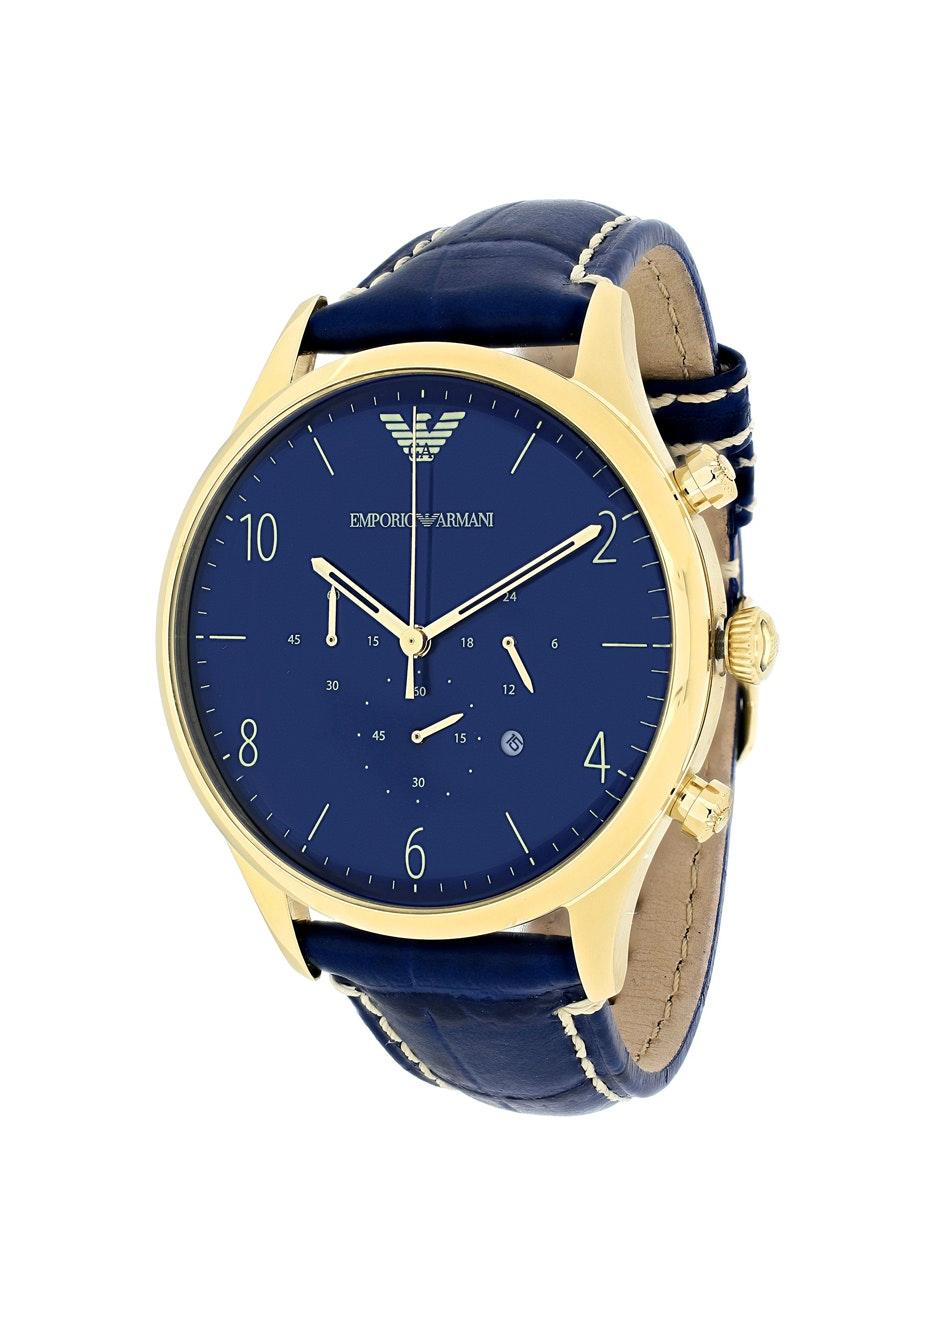 Armani Men's Classic - Blue/Blue